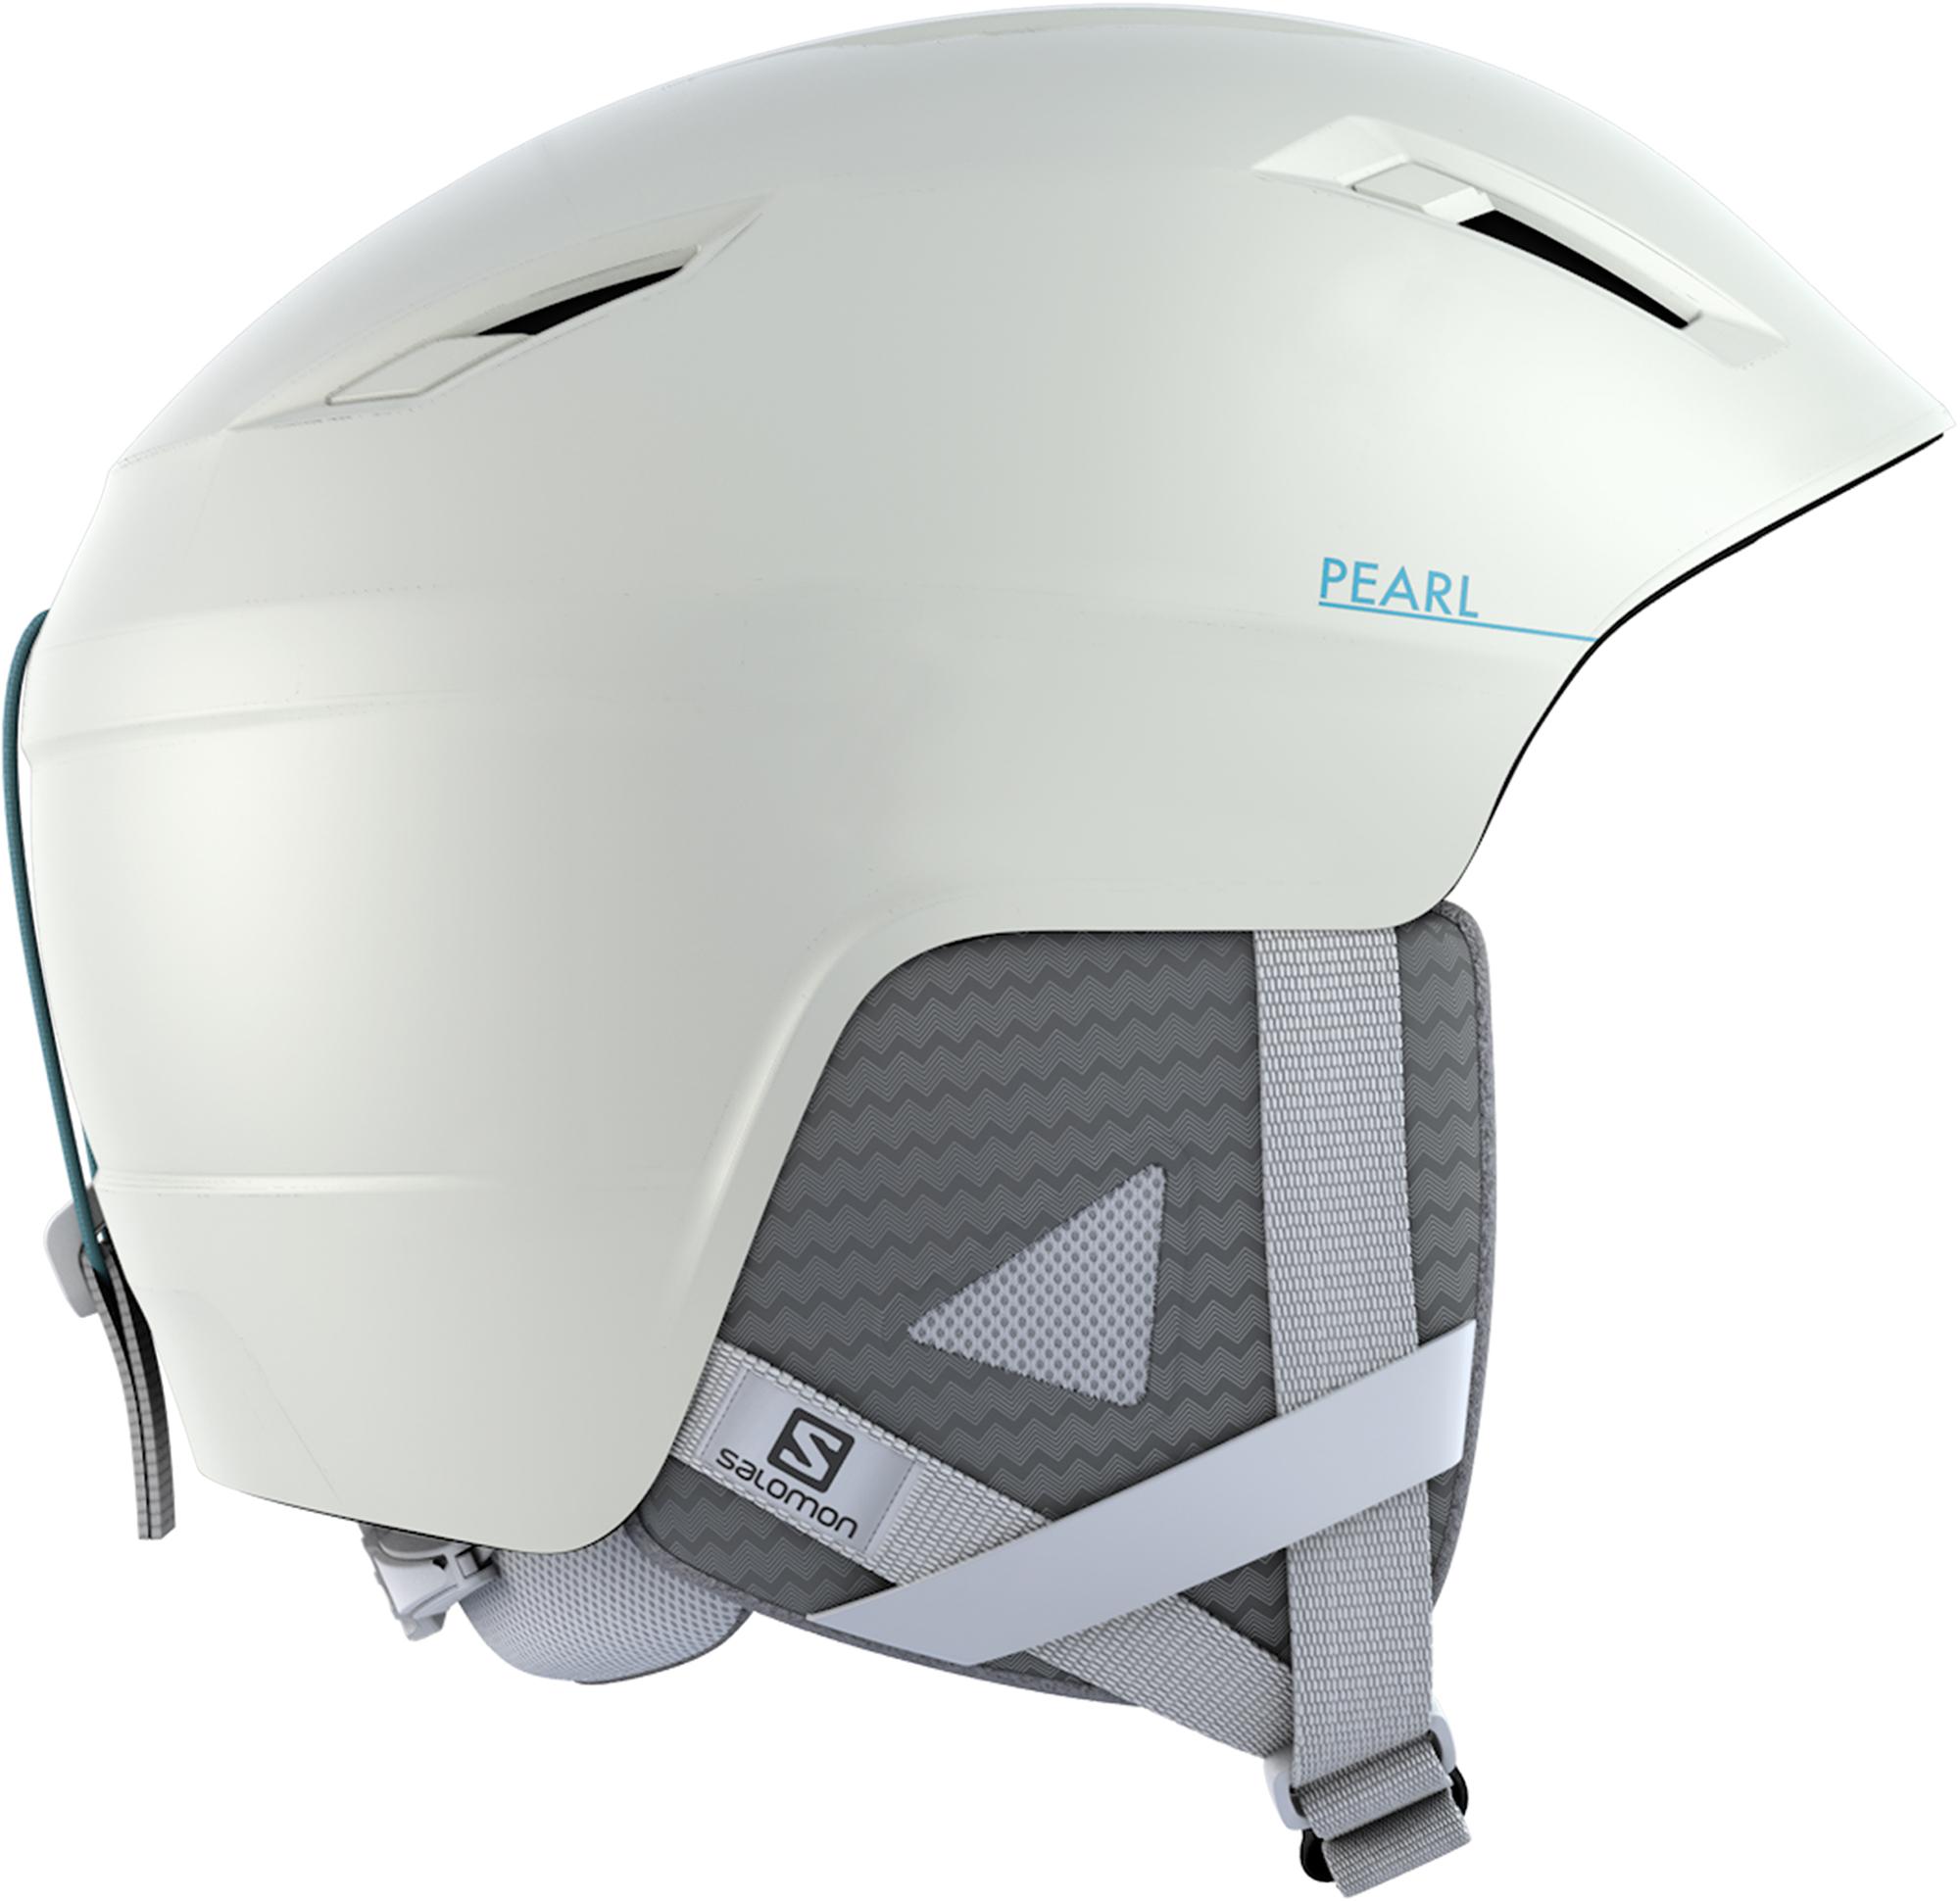 Salomon Шлем Salomon Pearl горнолыжный шлем salomon salomon allium custom air черный s 53 56